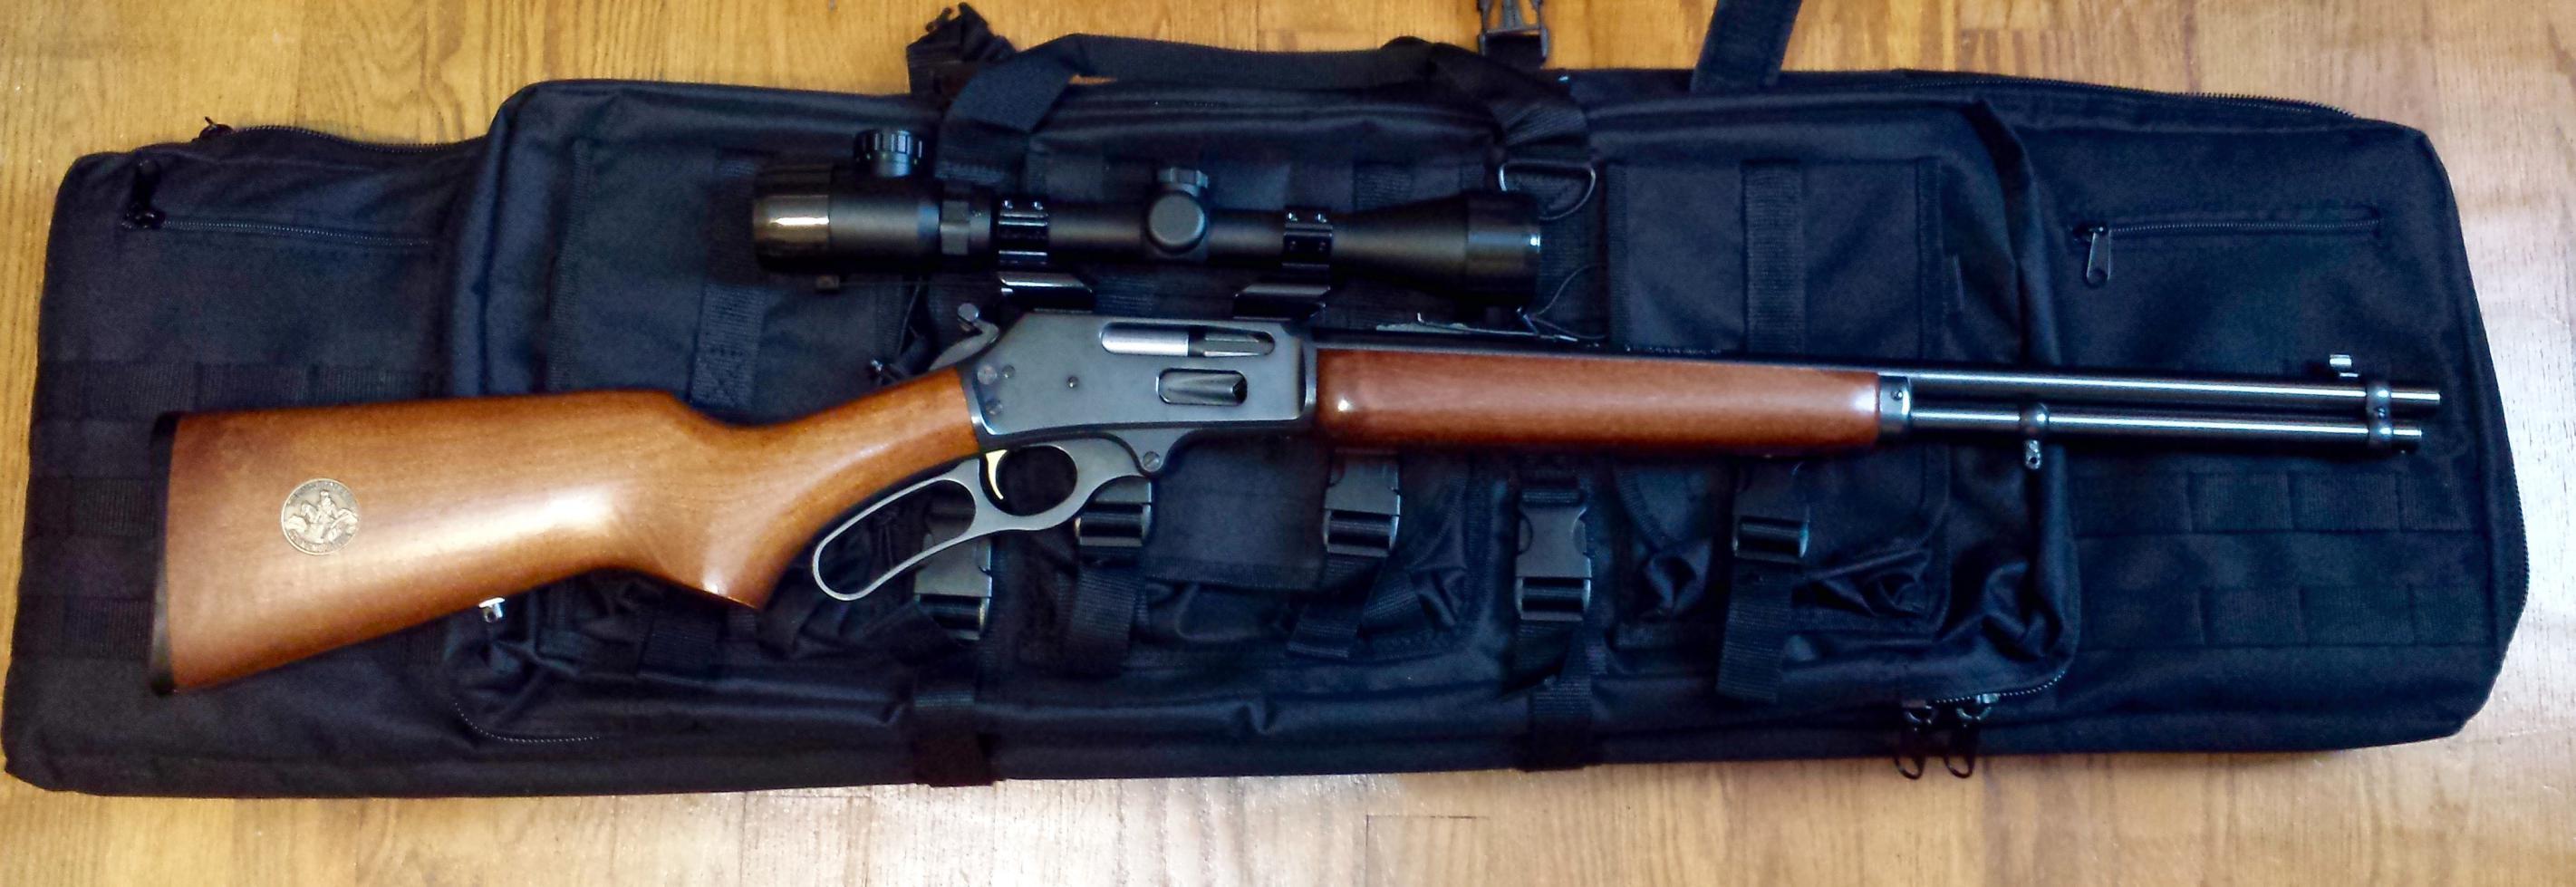 Marlin 336 which caliber?-img_0198.jpg